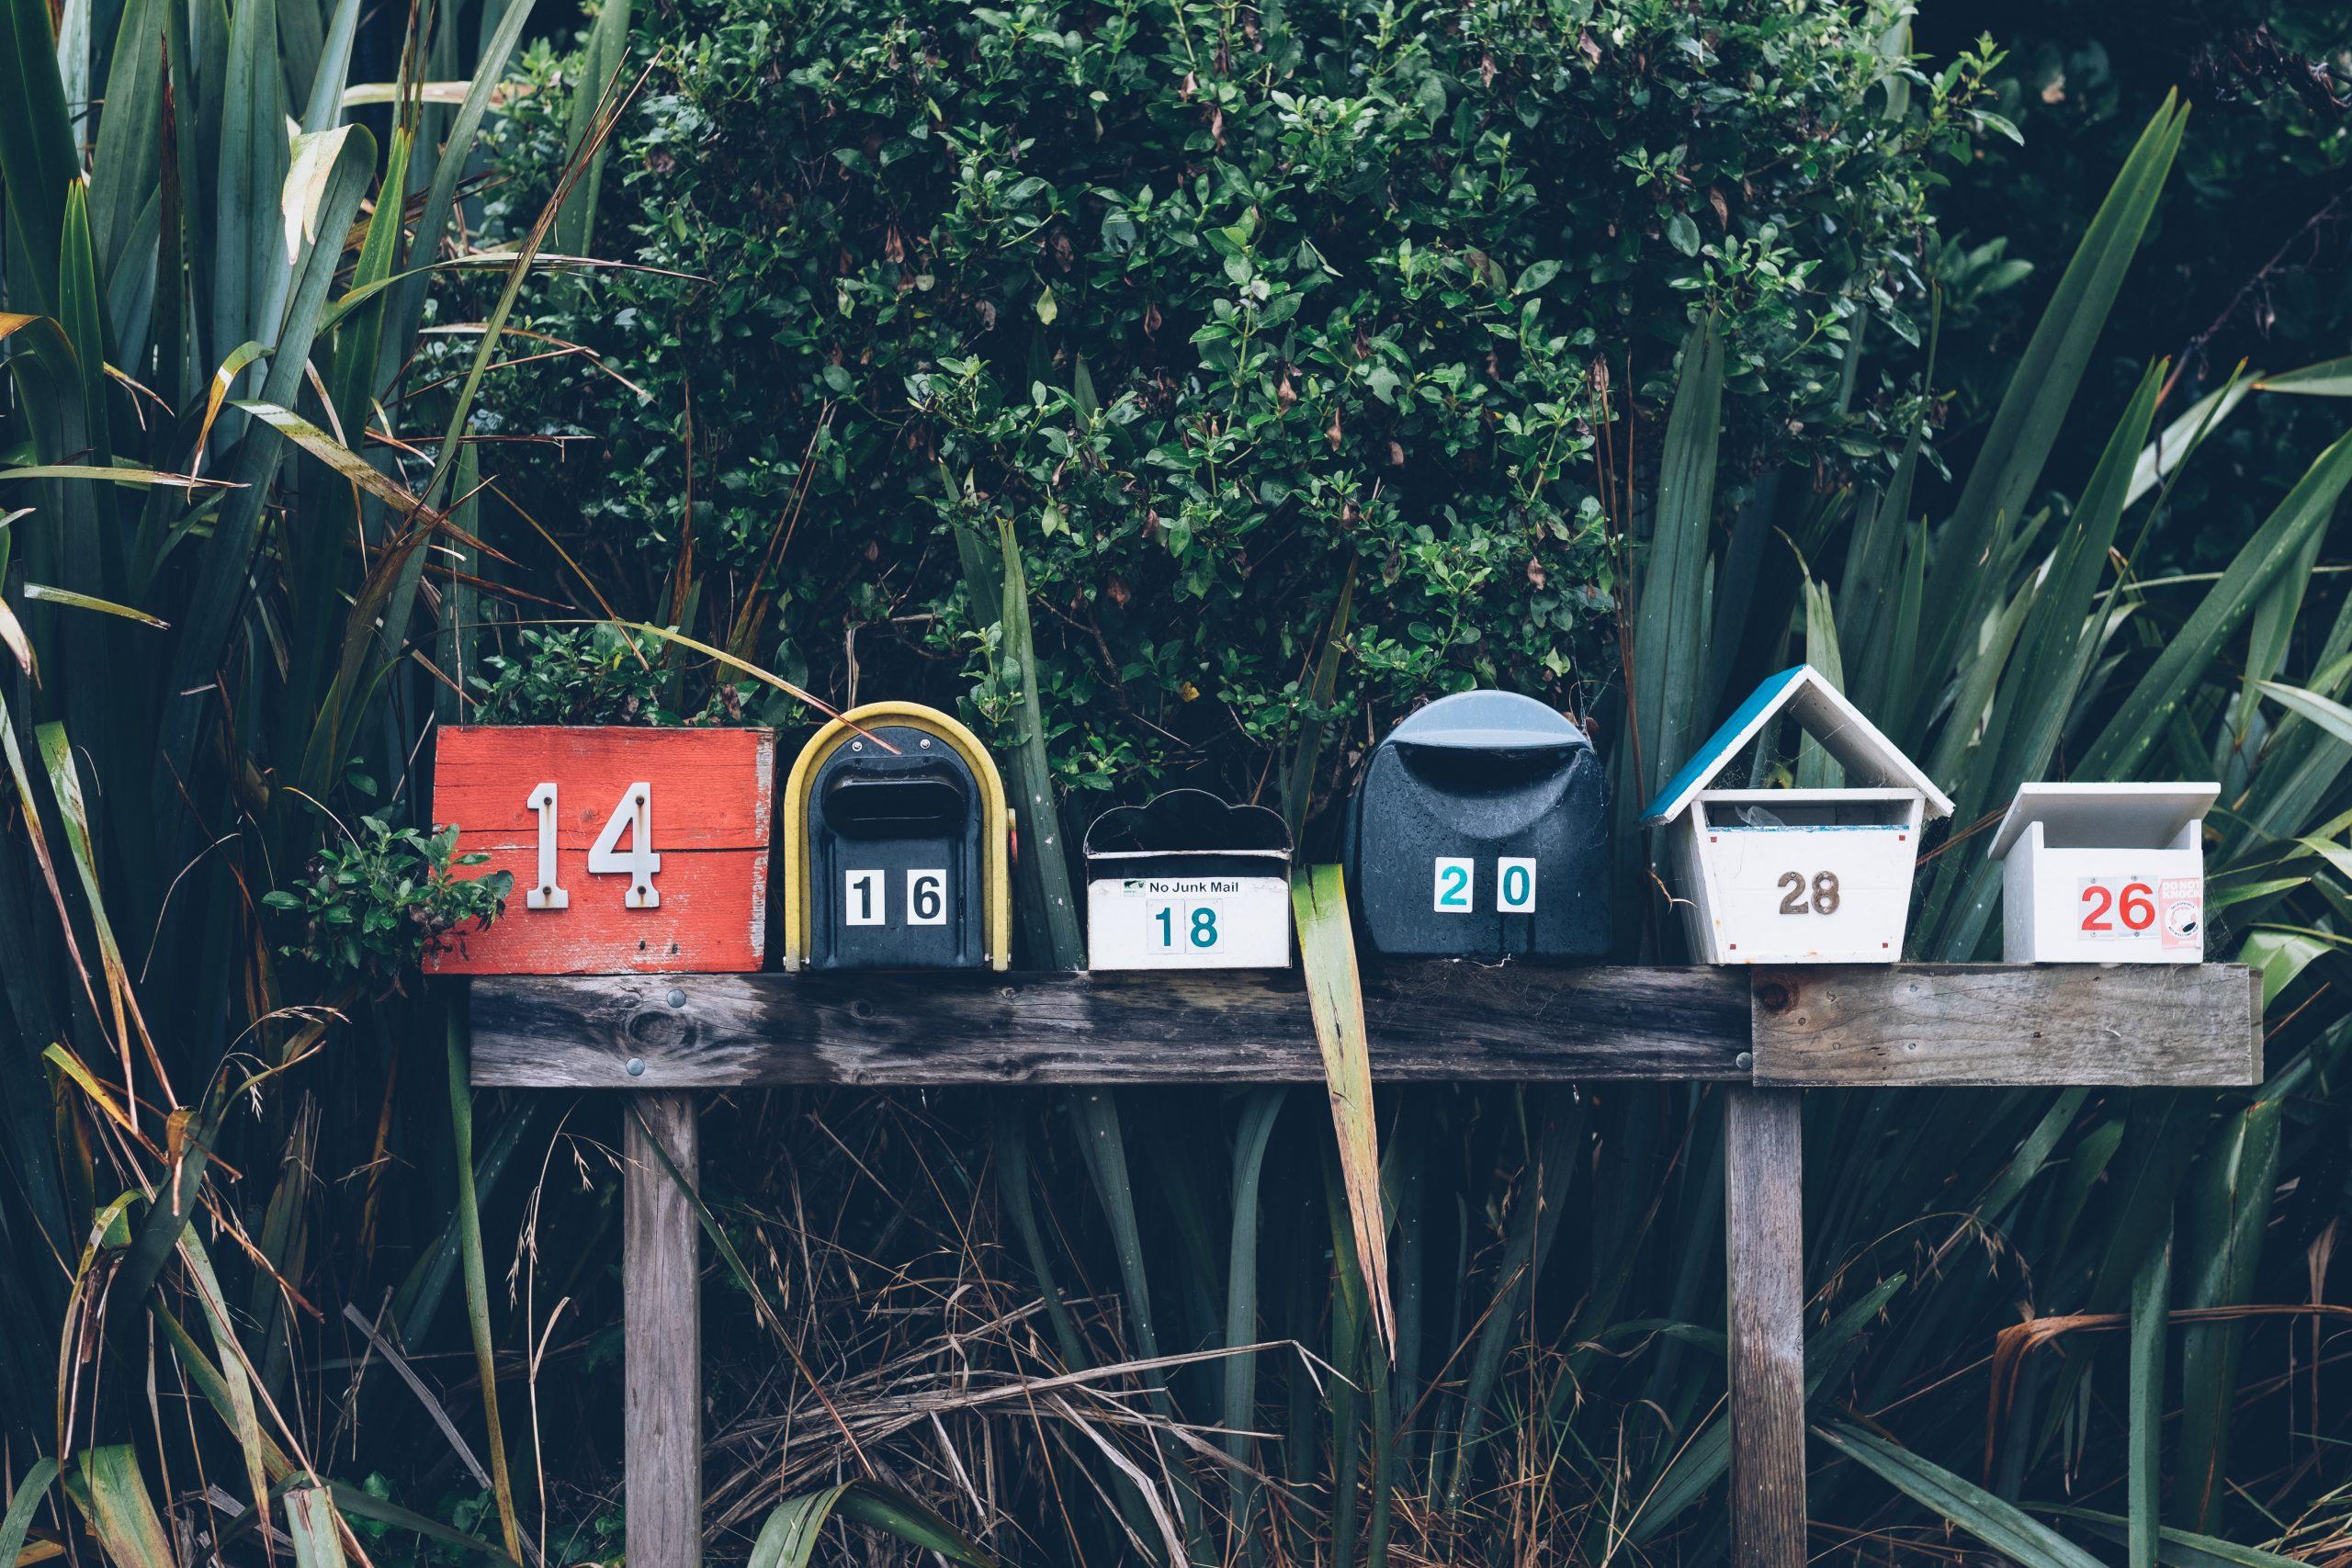 row of neighborhood mailboxes